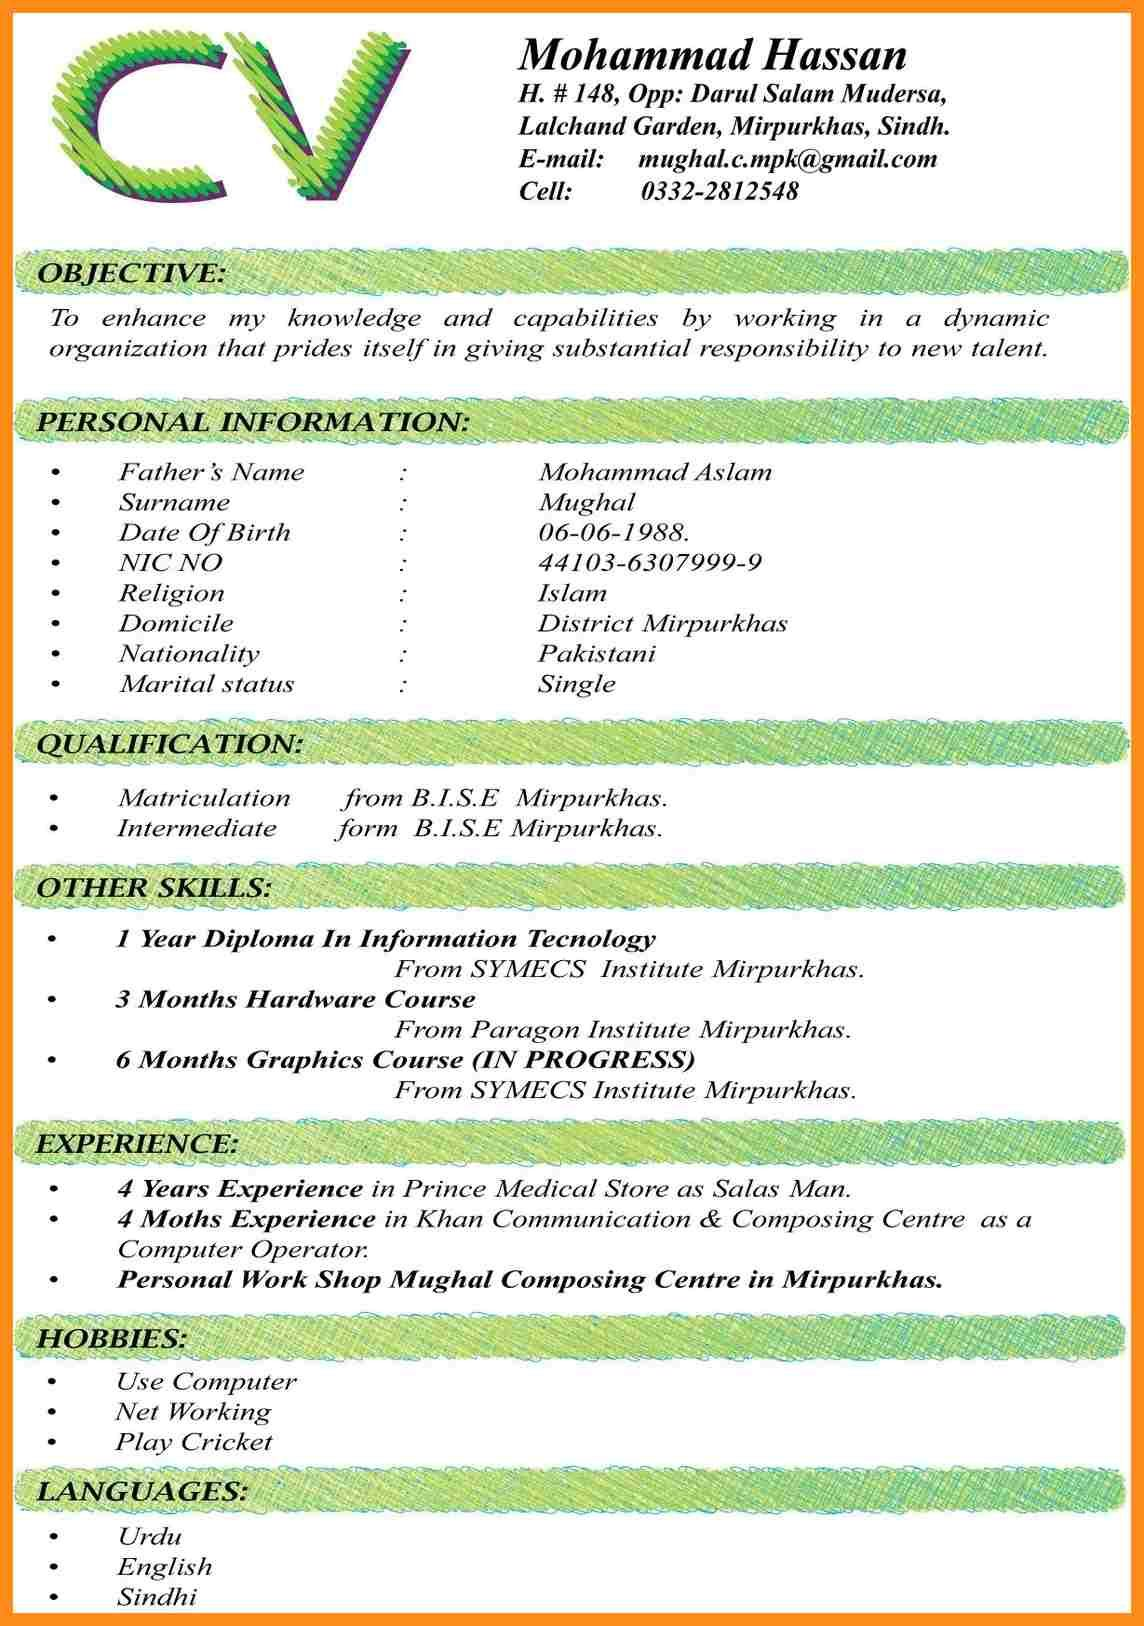 Job Cv Format Download Pdf 8 Standard Cv Format Pdf Resume Setups Cv Format Resume Format For Freshers Cv Format For Job